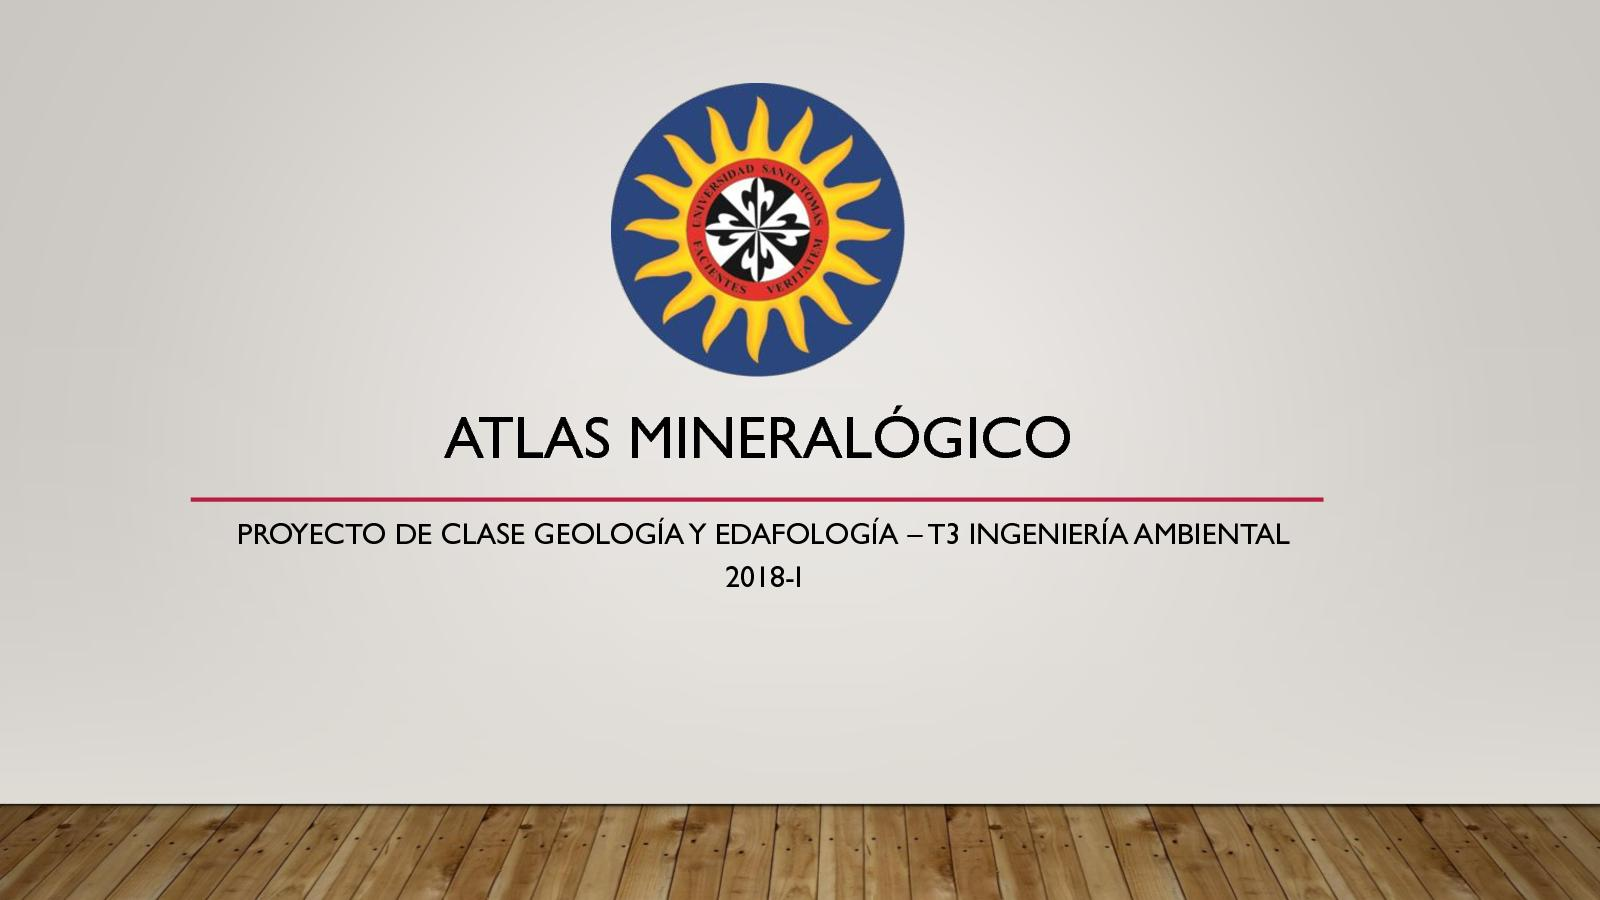 Atlas Mineralógico Ambiental